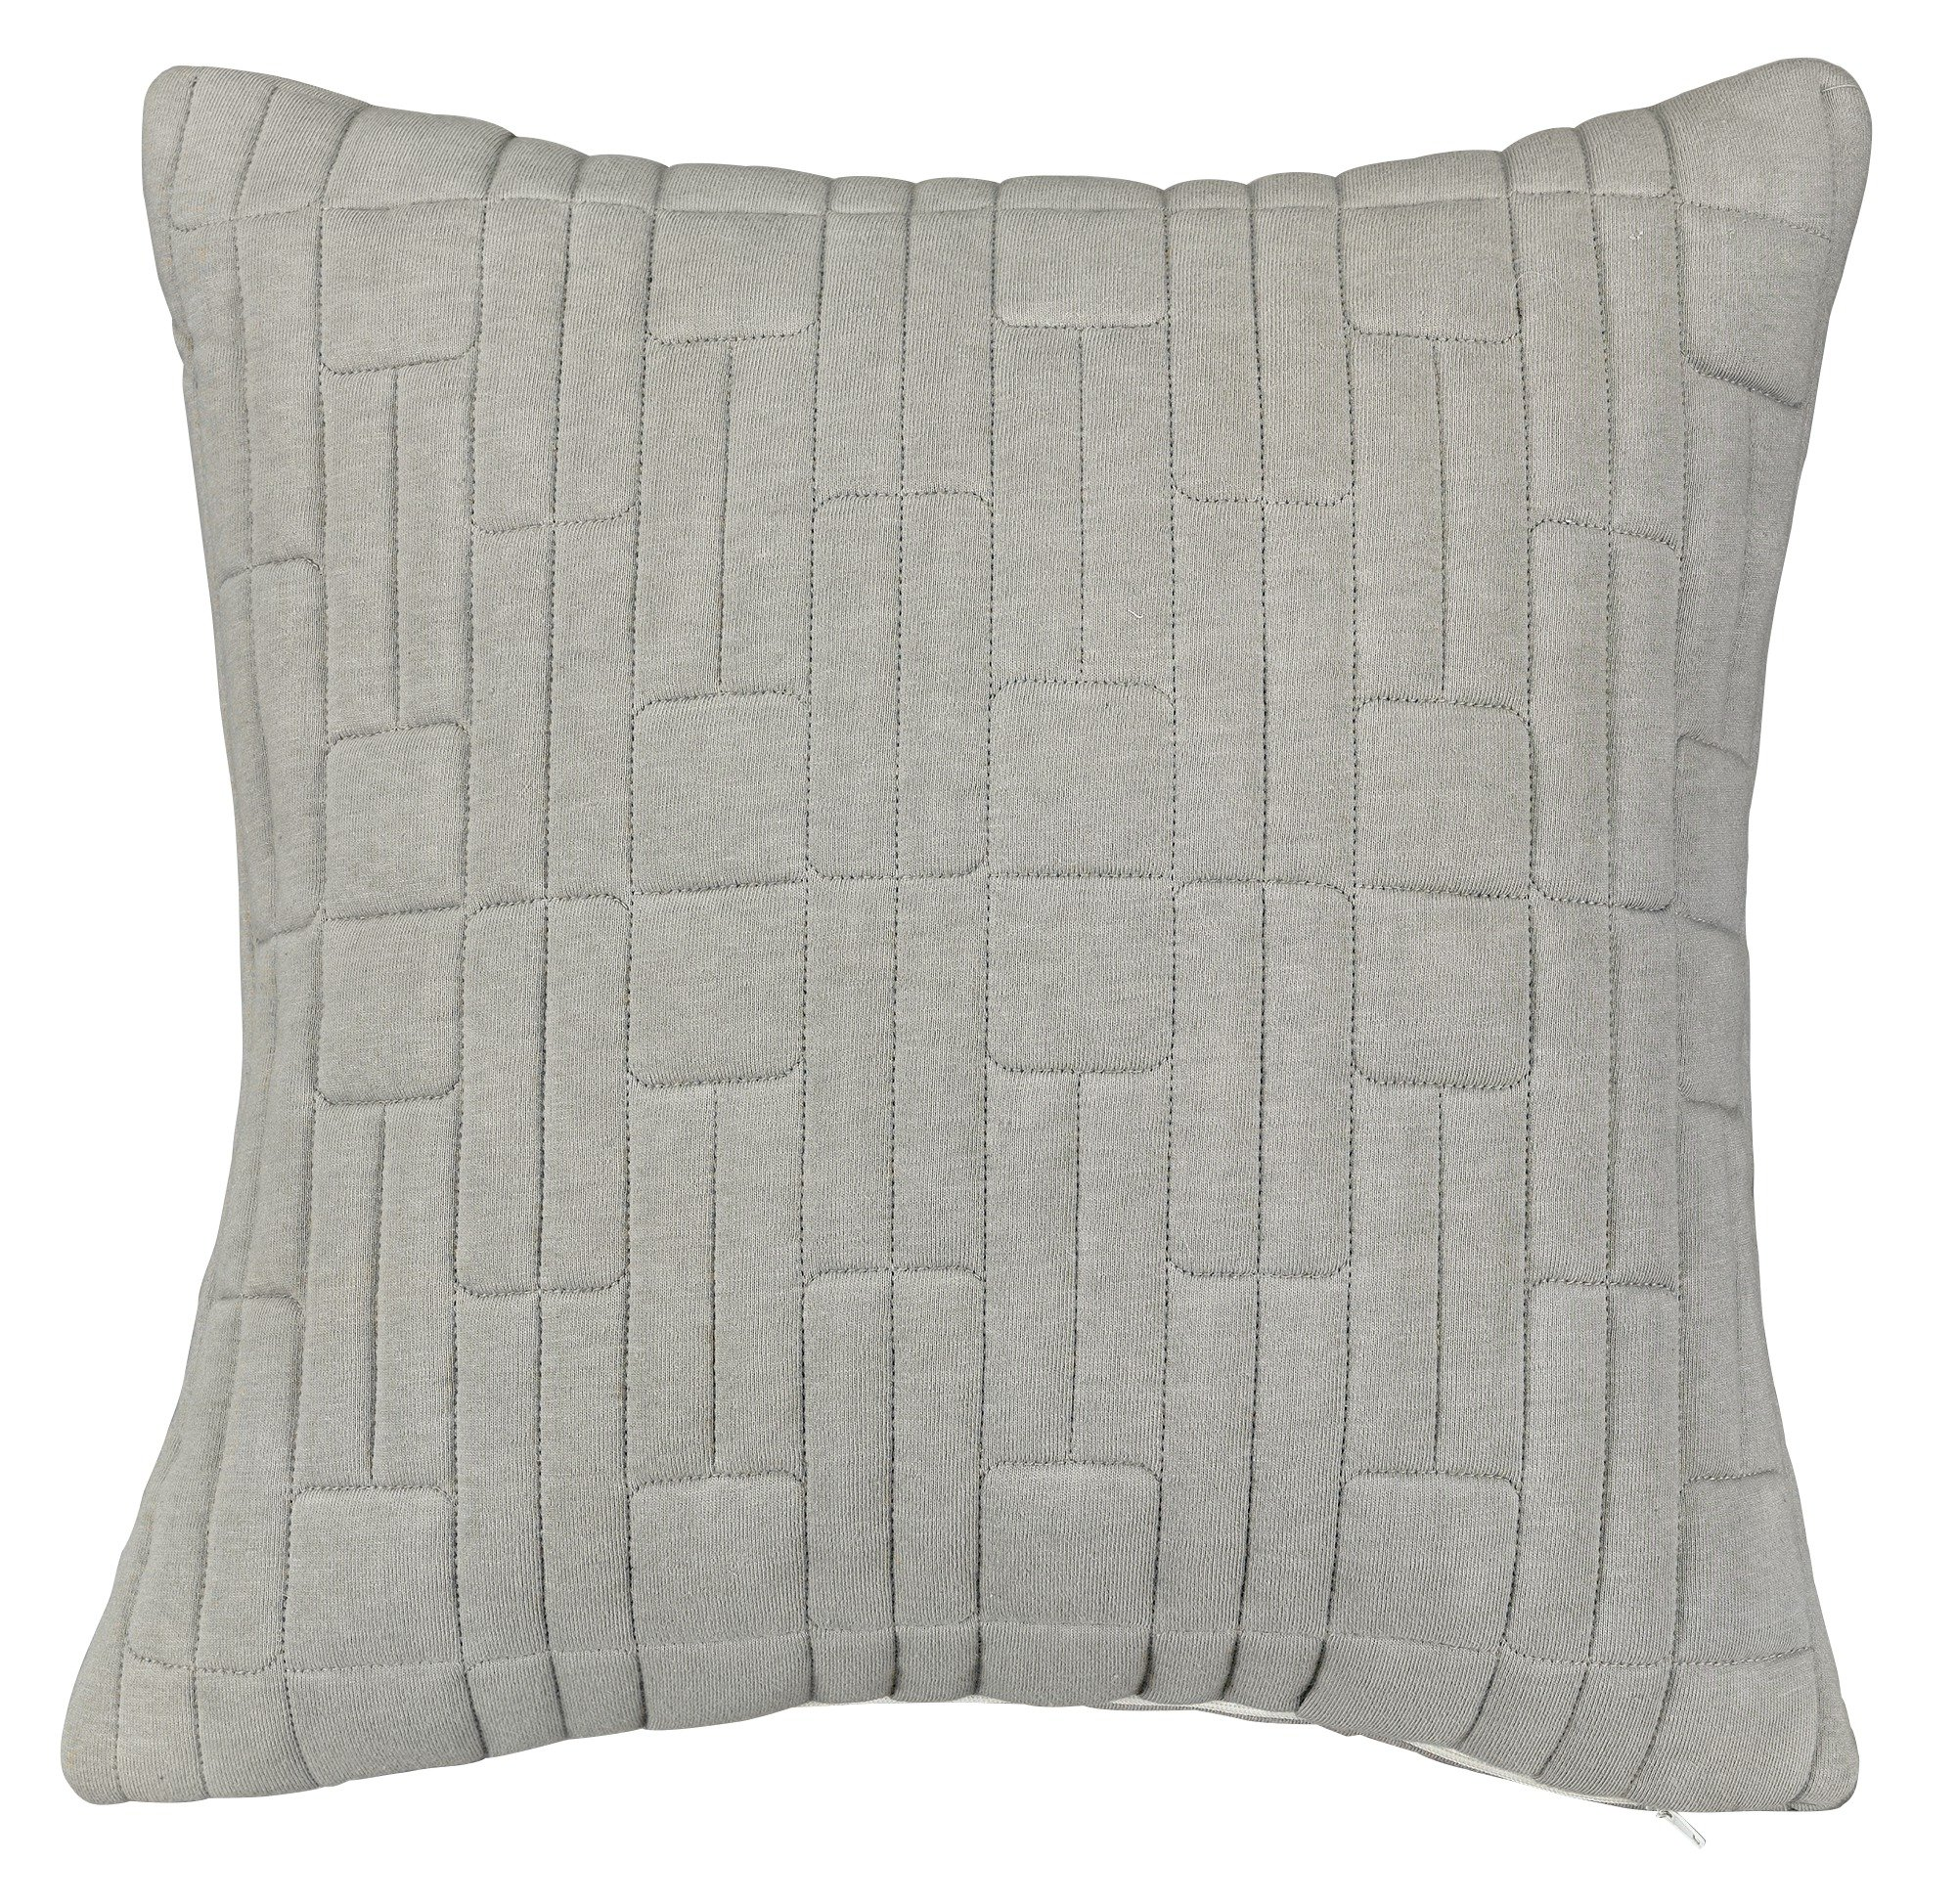 Heart of House Cellulous Cushion